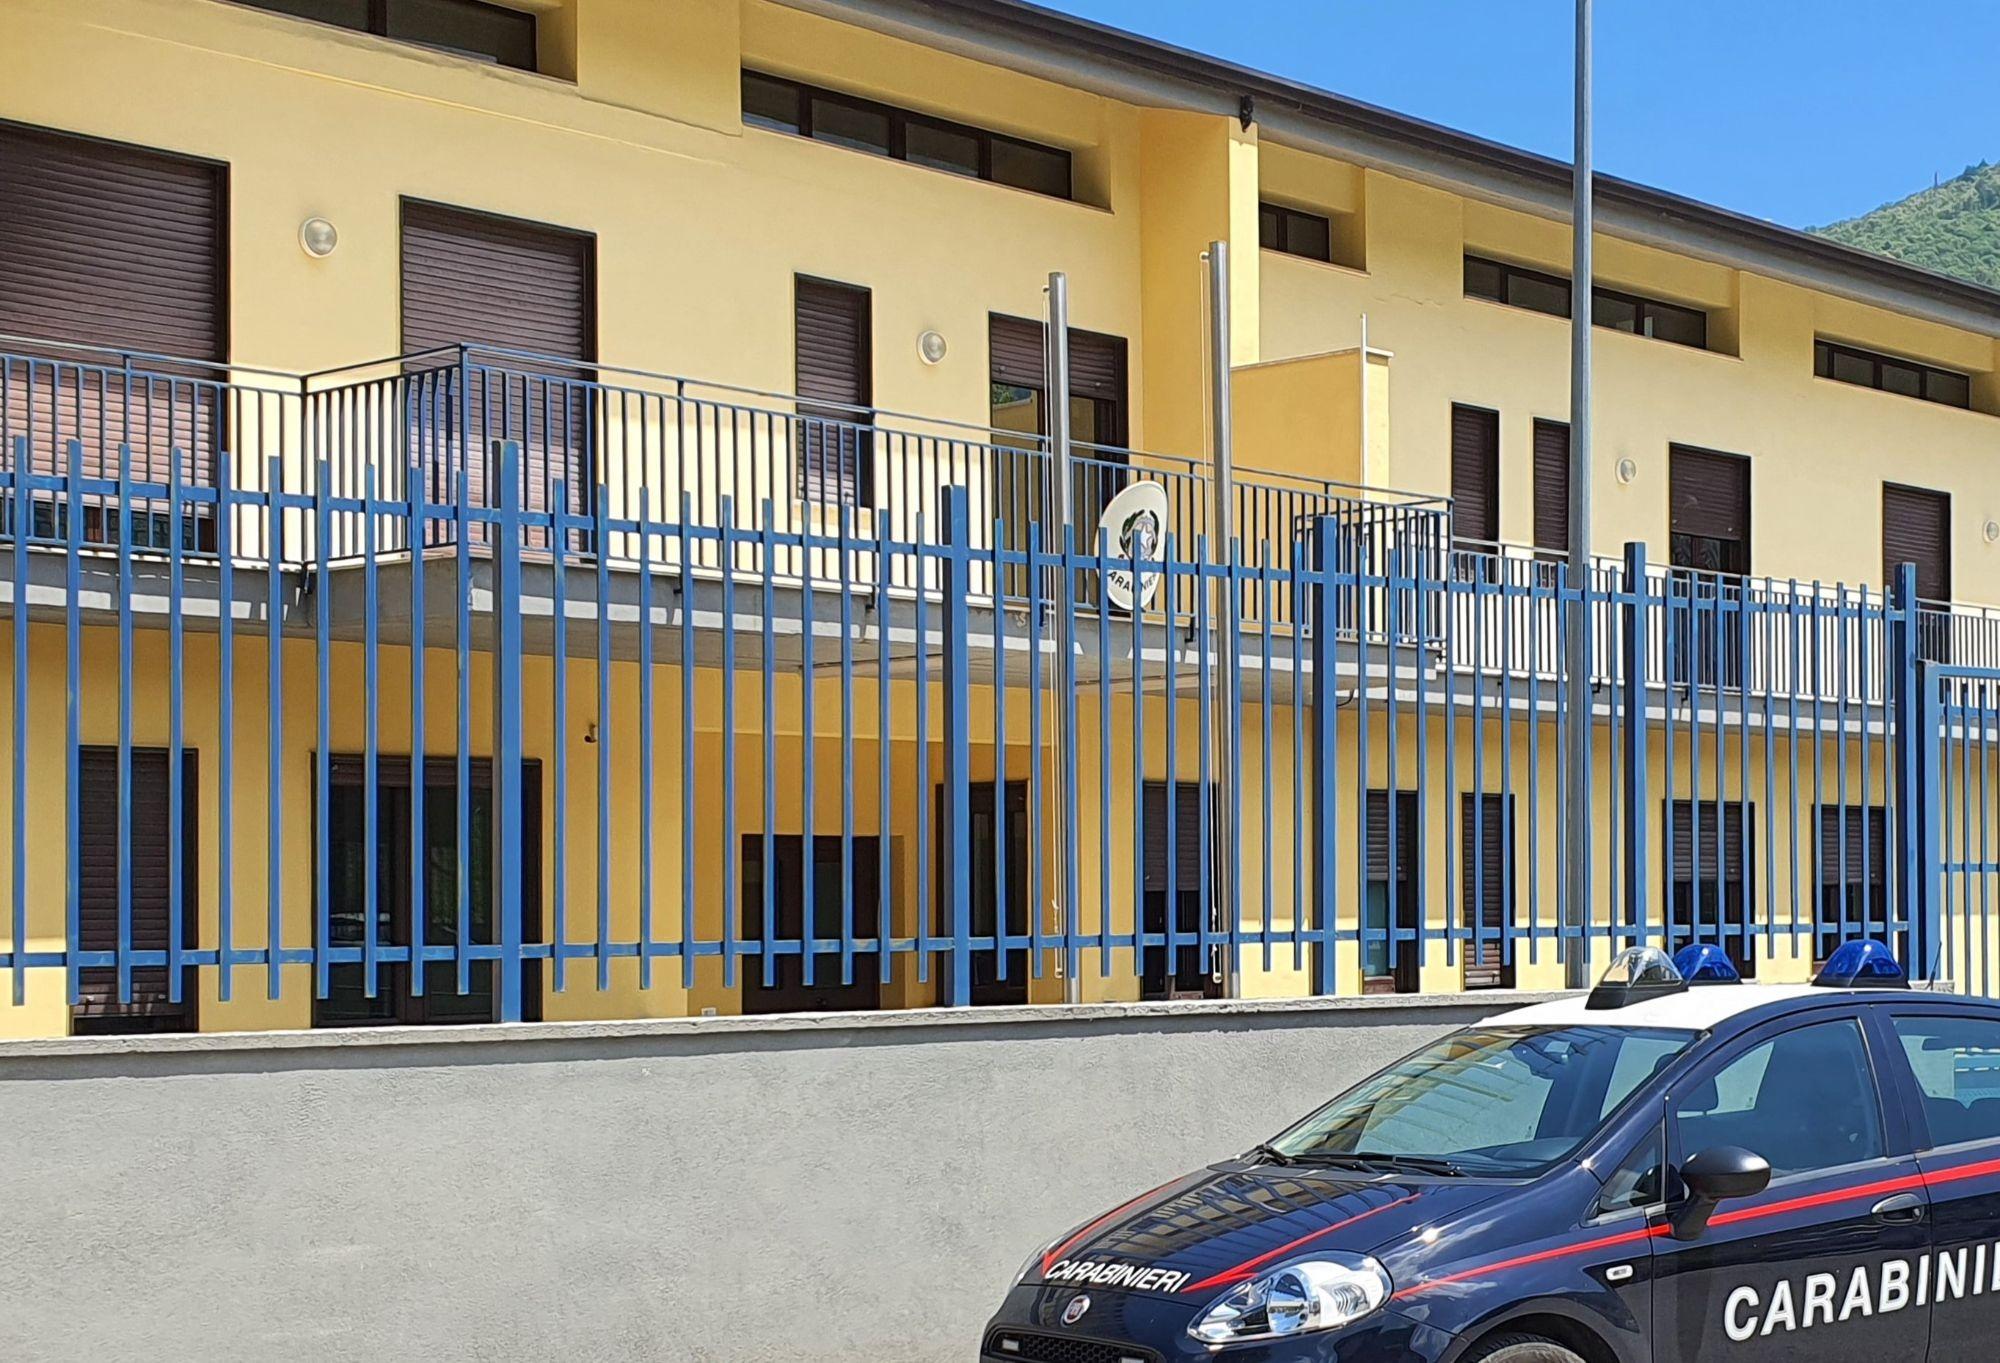 autocarabinieri-1623079013.jpg